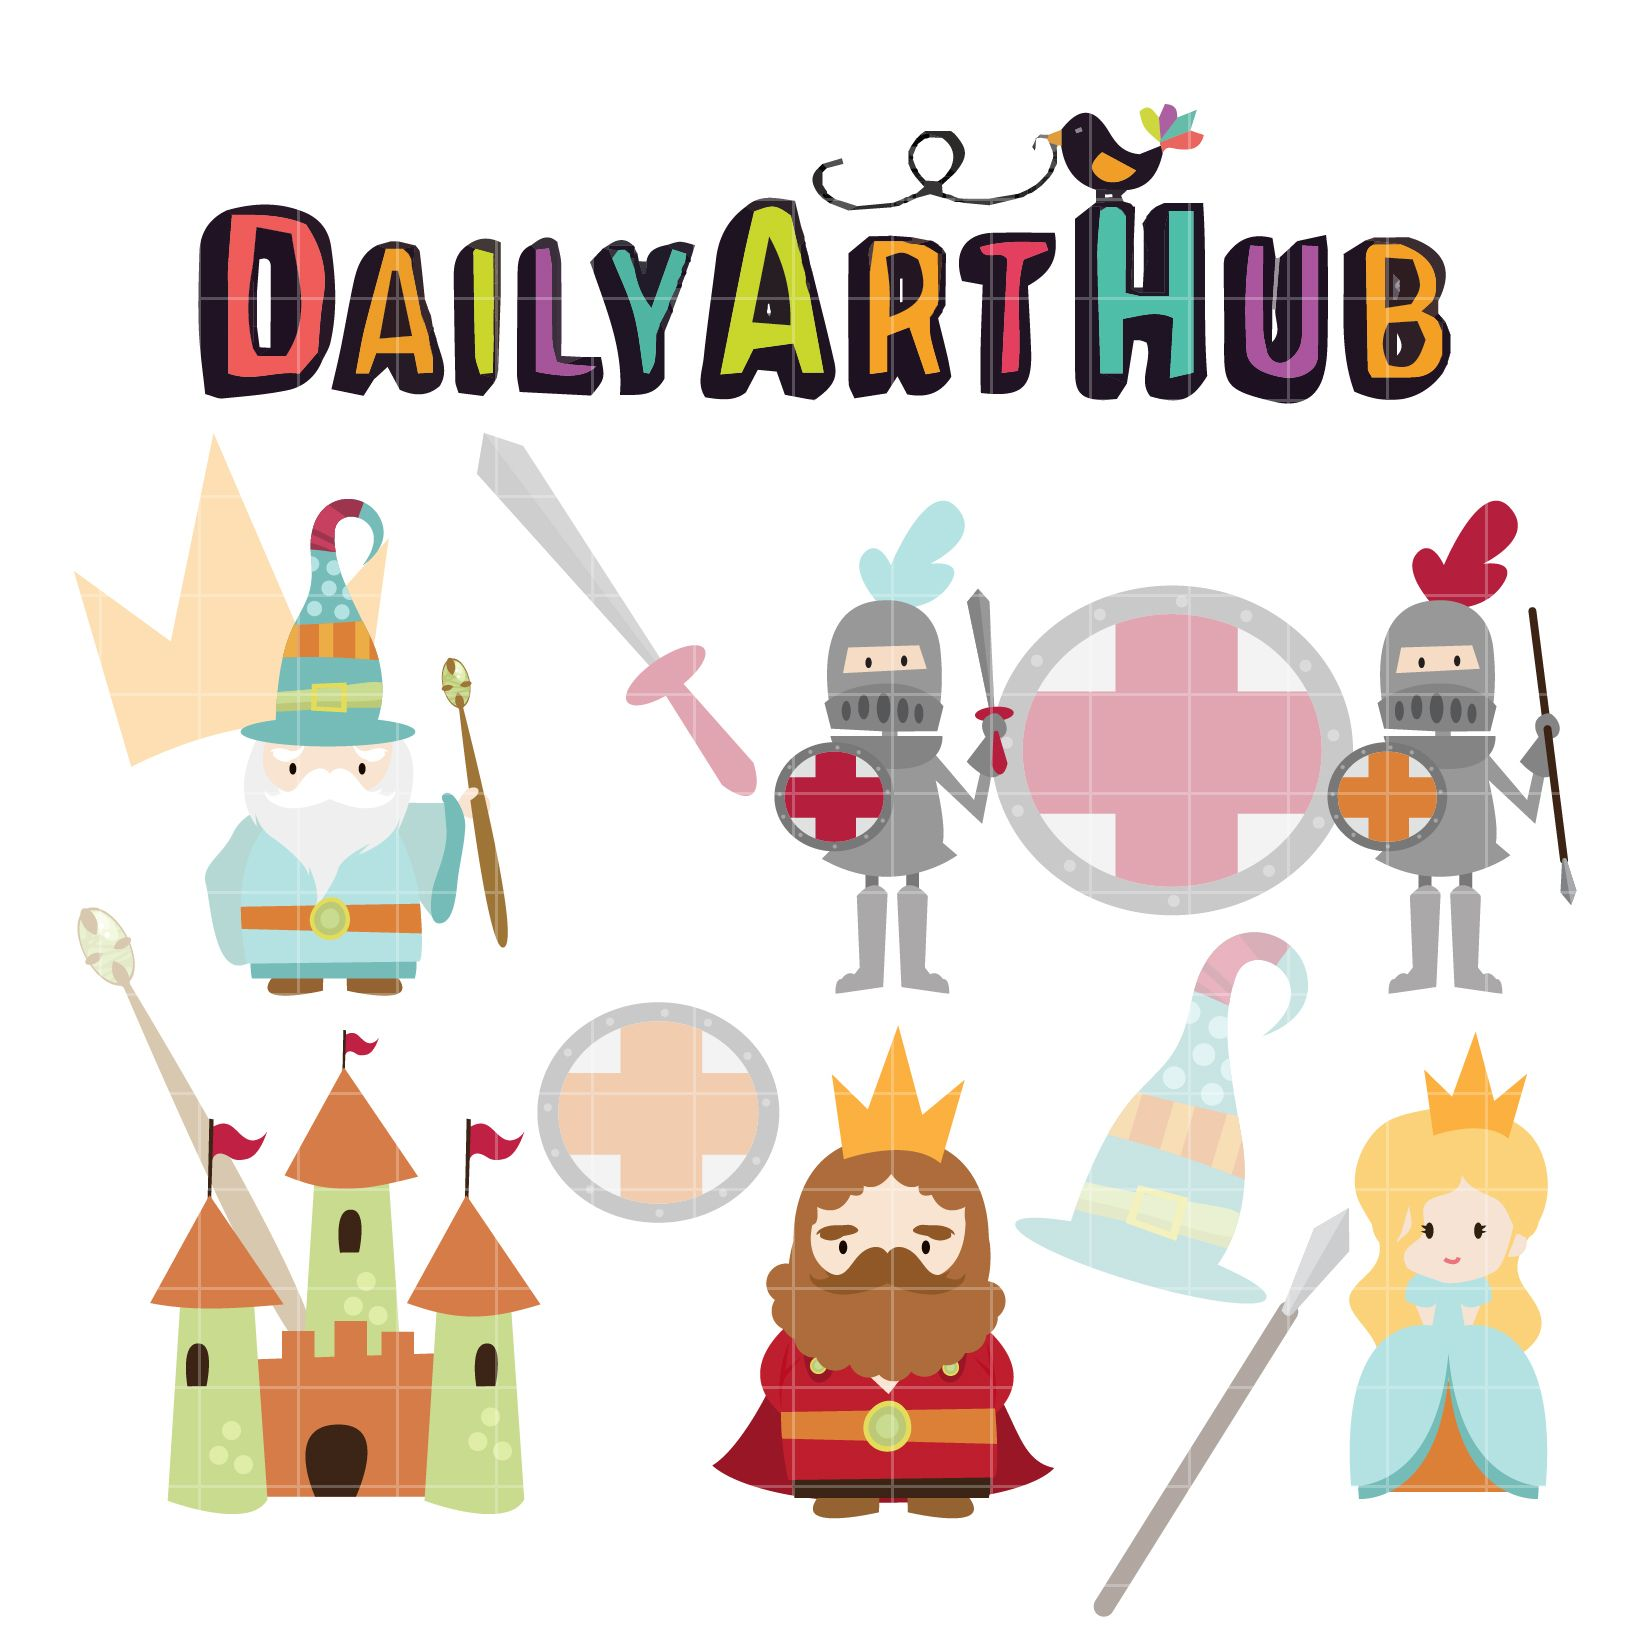 Cute Fantasy Characters Clip Art Set Daily Art Hub Free Clip Art Everyday Art Hub Art Set Fantasy Characters